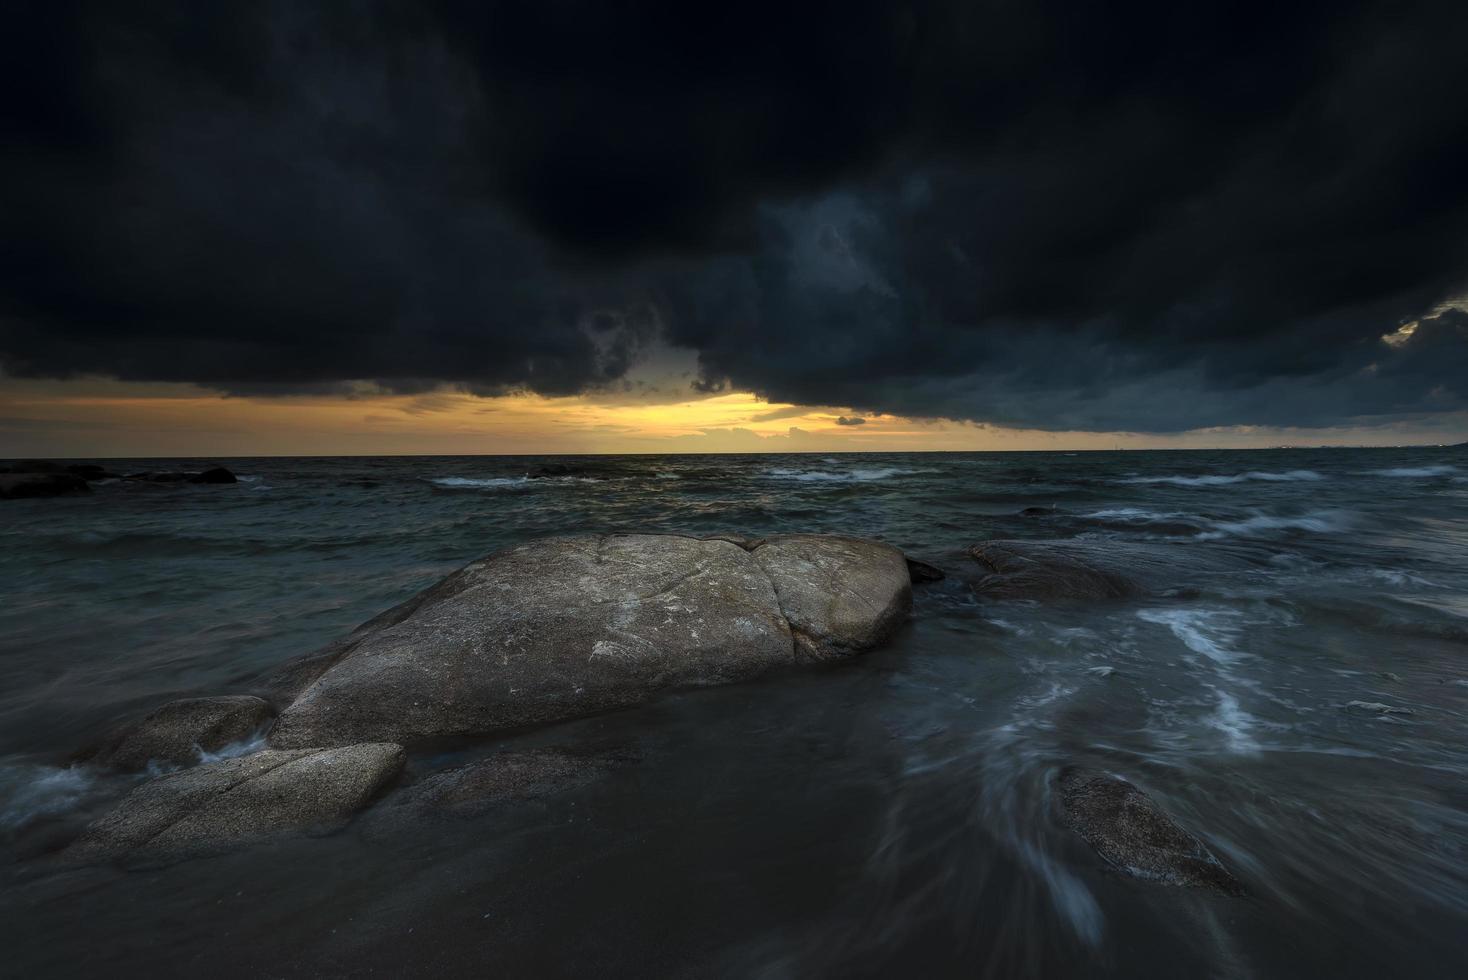 tormenta antes del atardecer en el mar foto